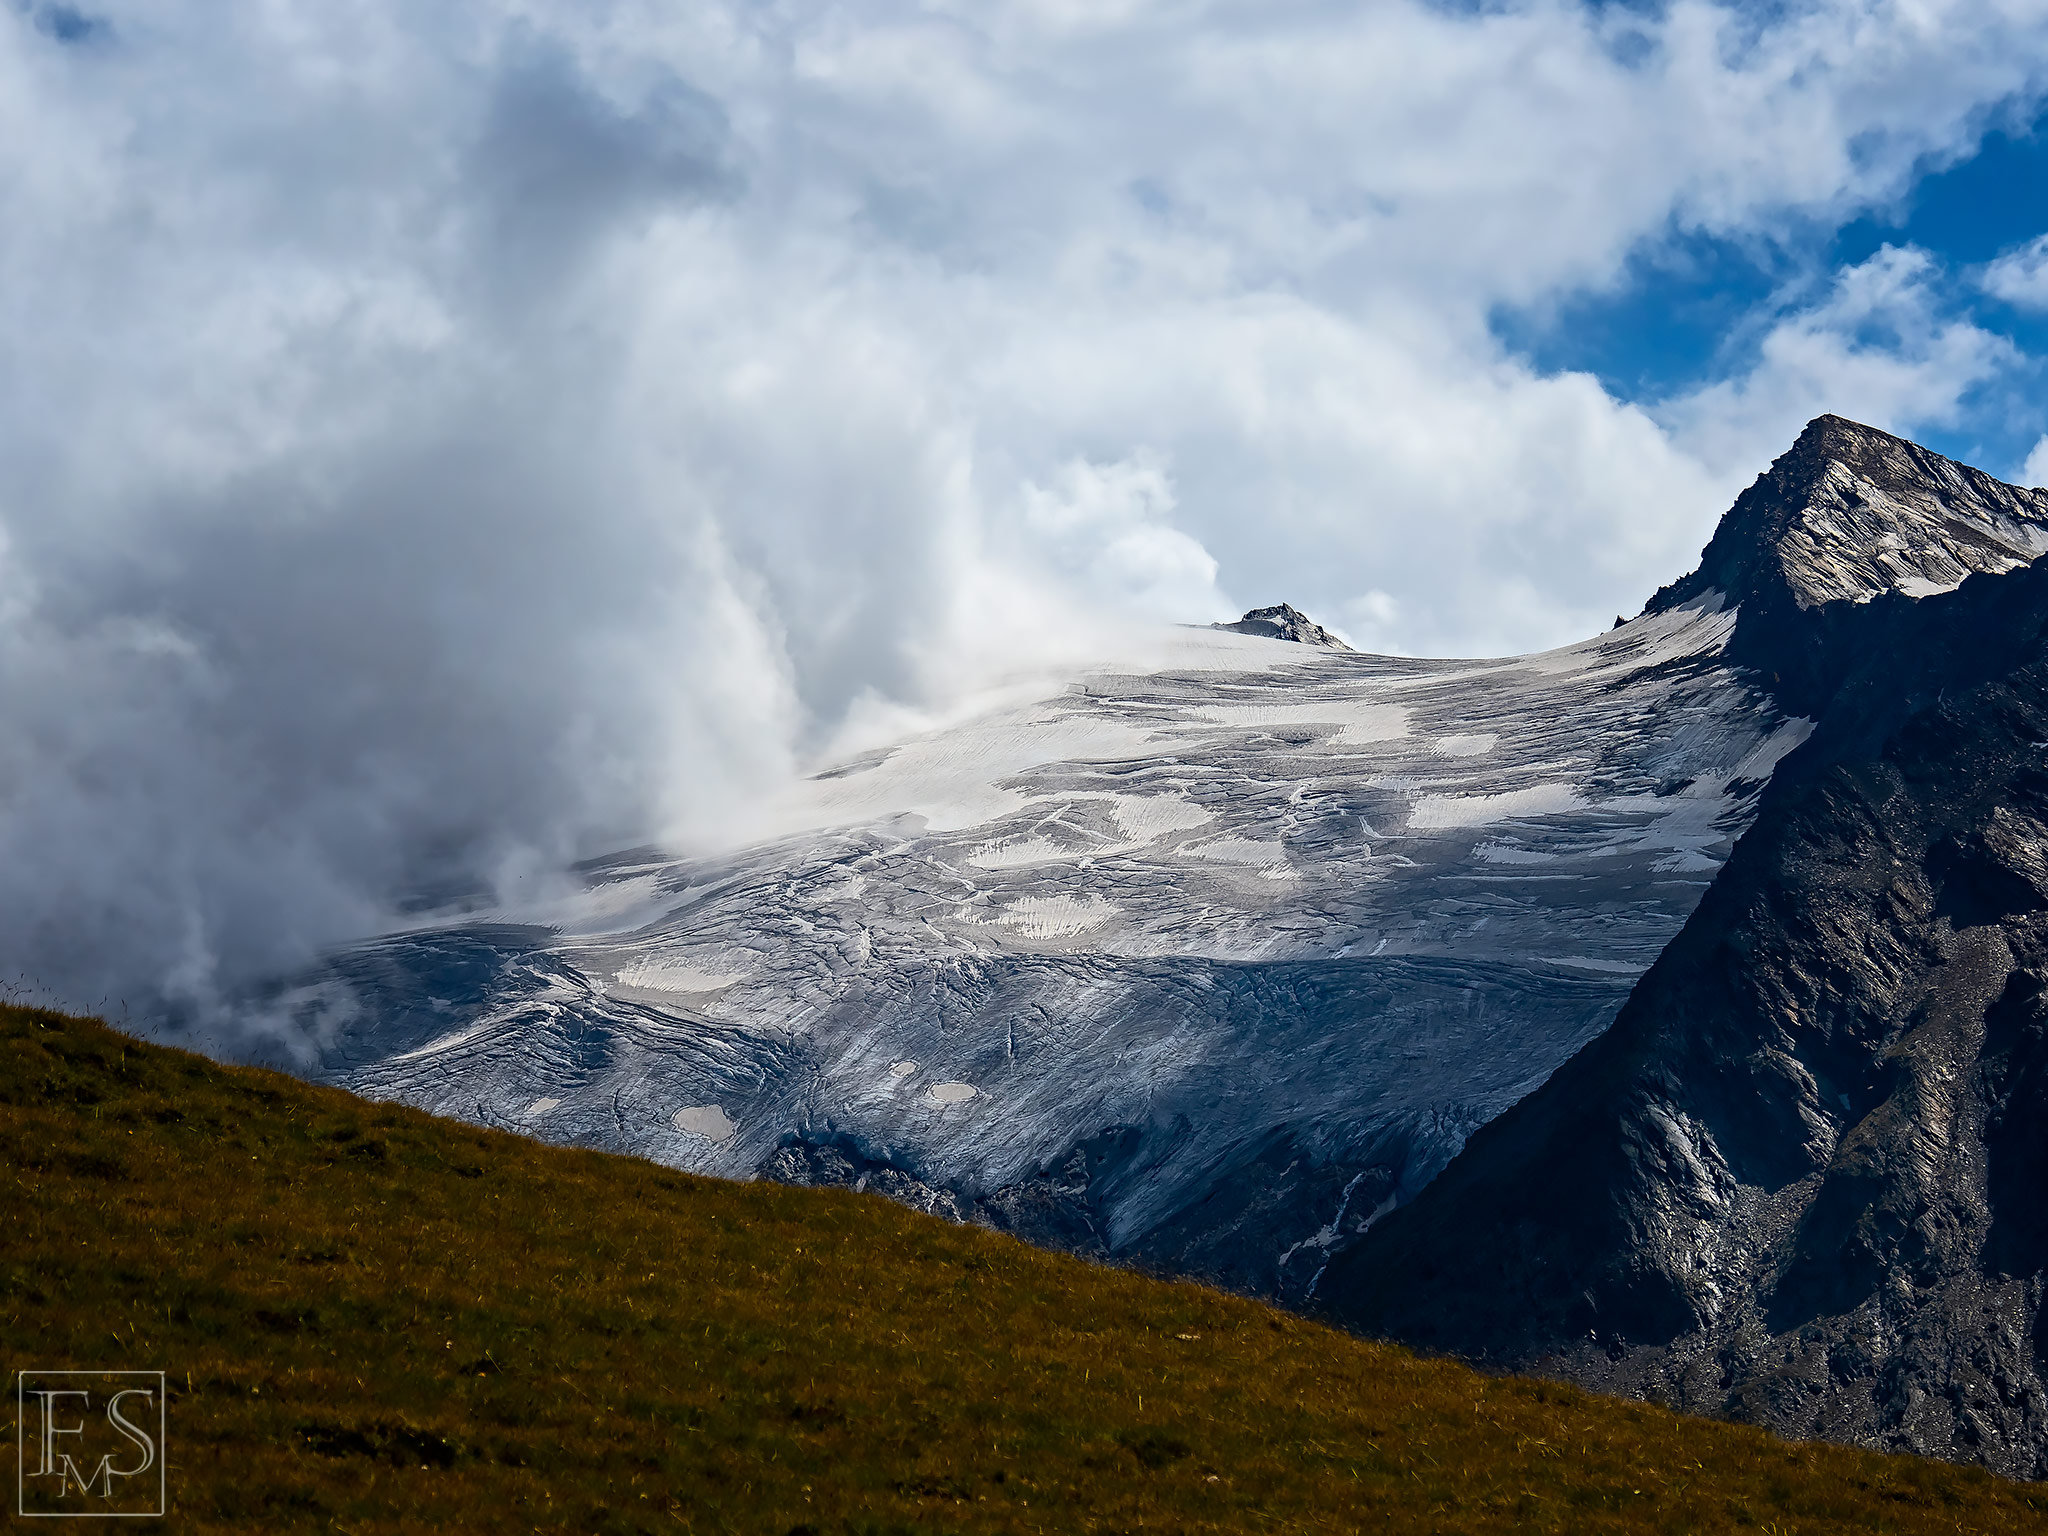 tztal 2018 hohe mut vulkane und natur fotografie